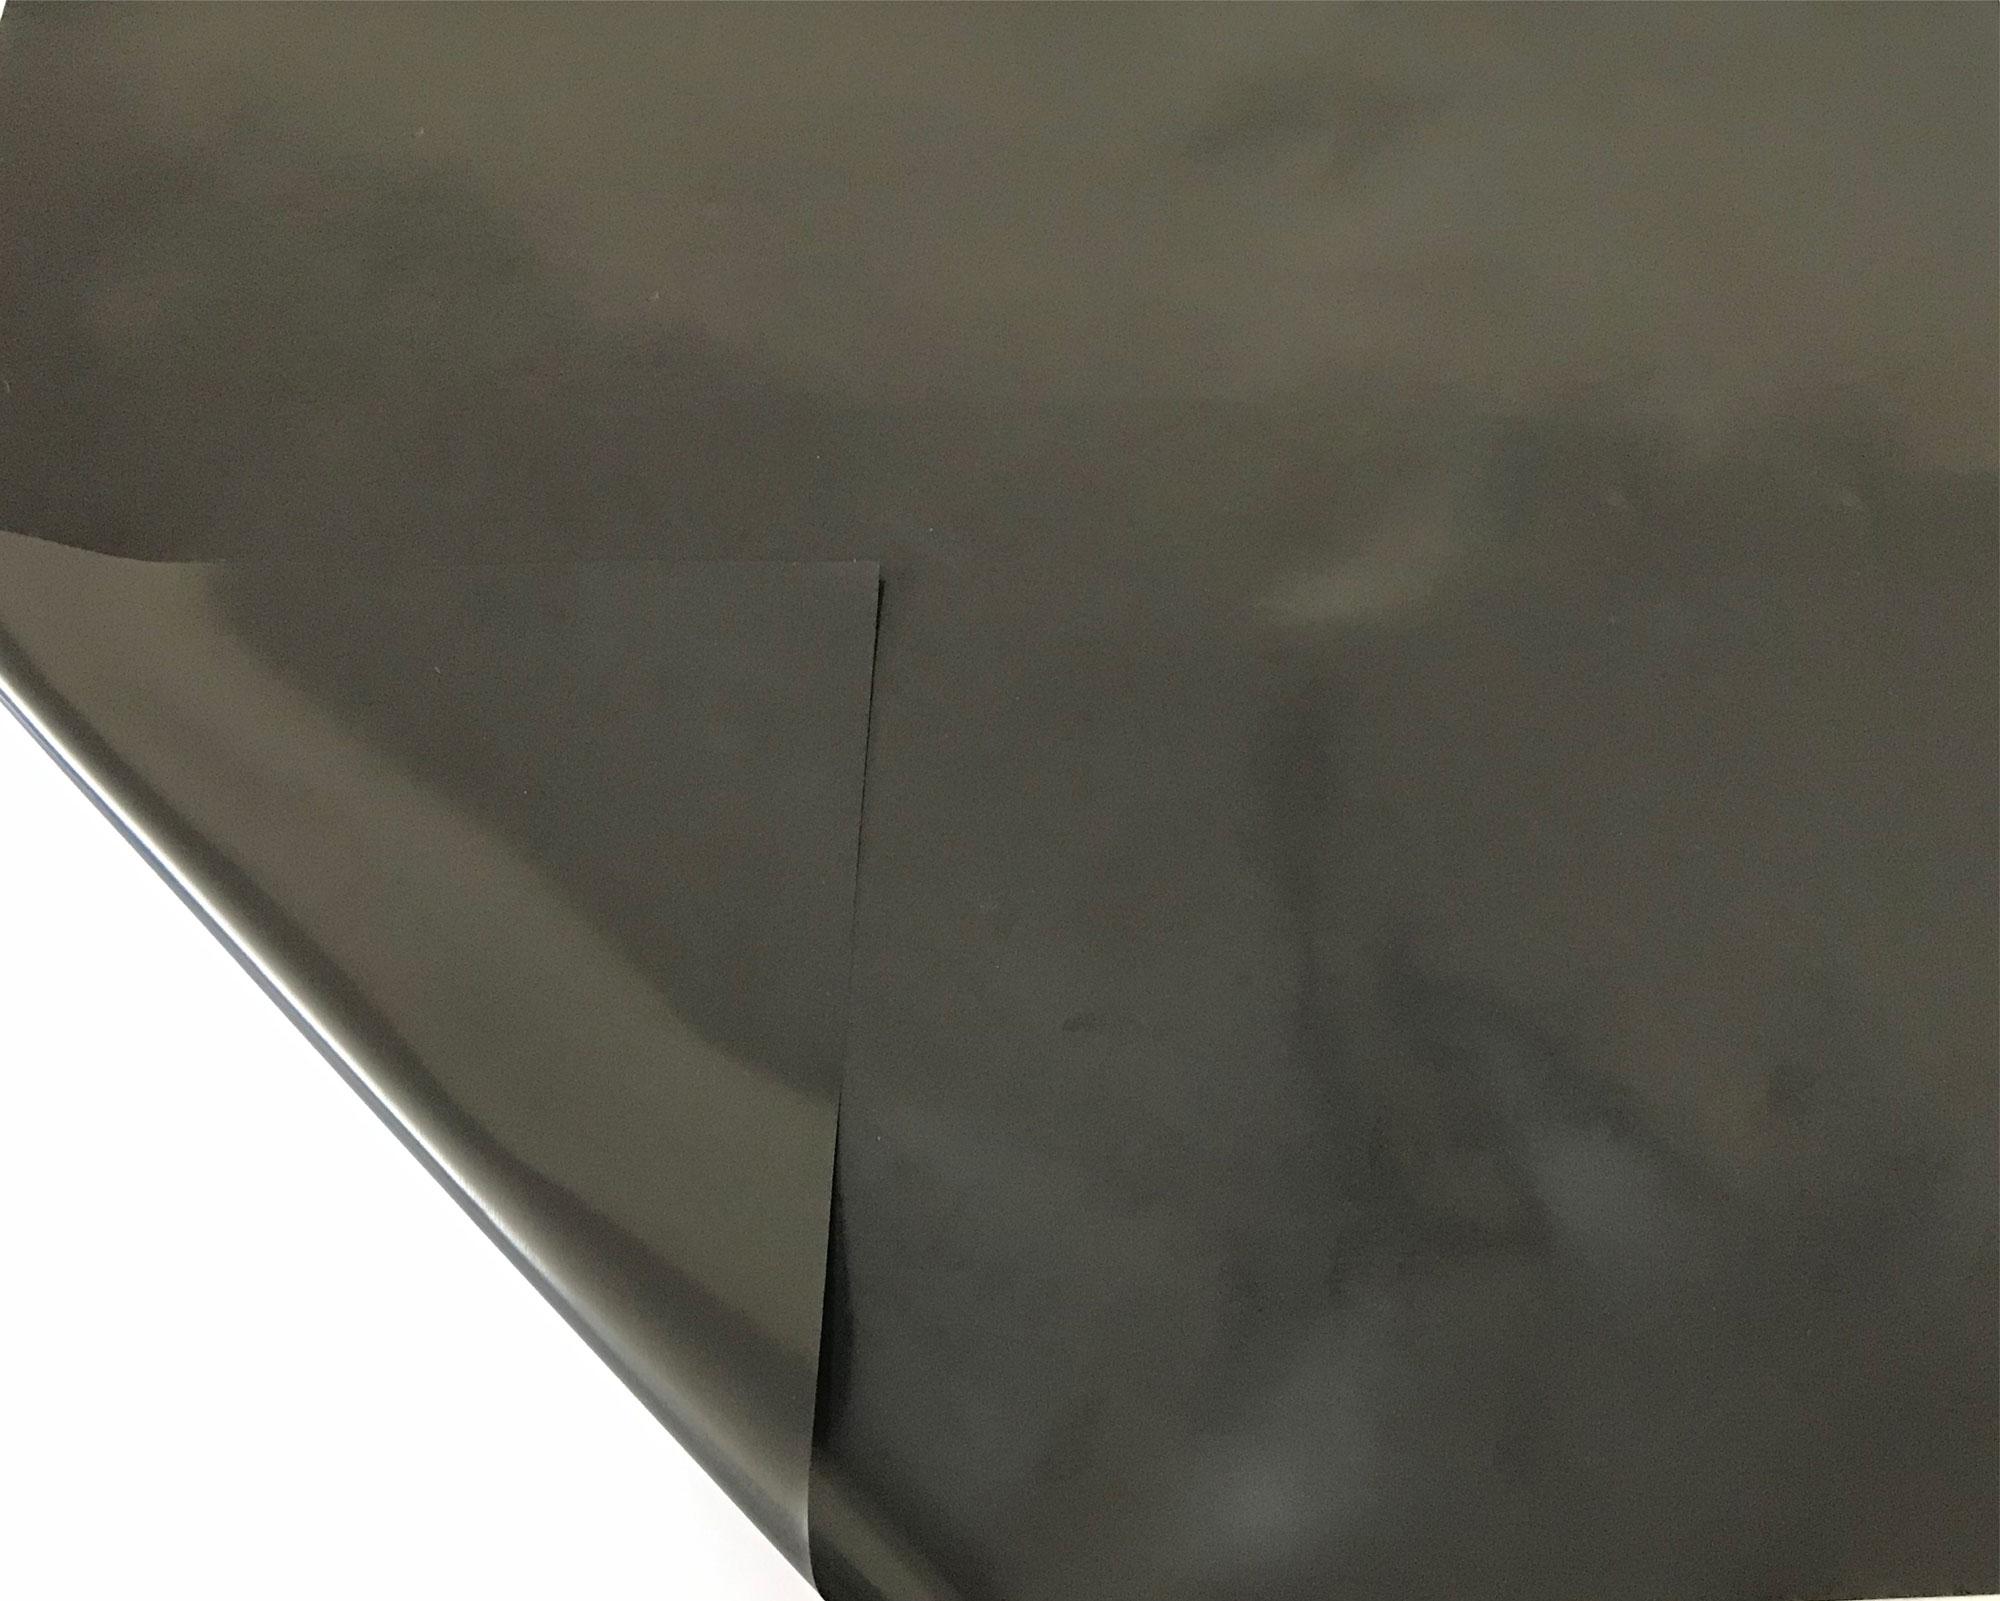 Lona Geomembrana + Manta Bidim 300 Micras - 2,5x2